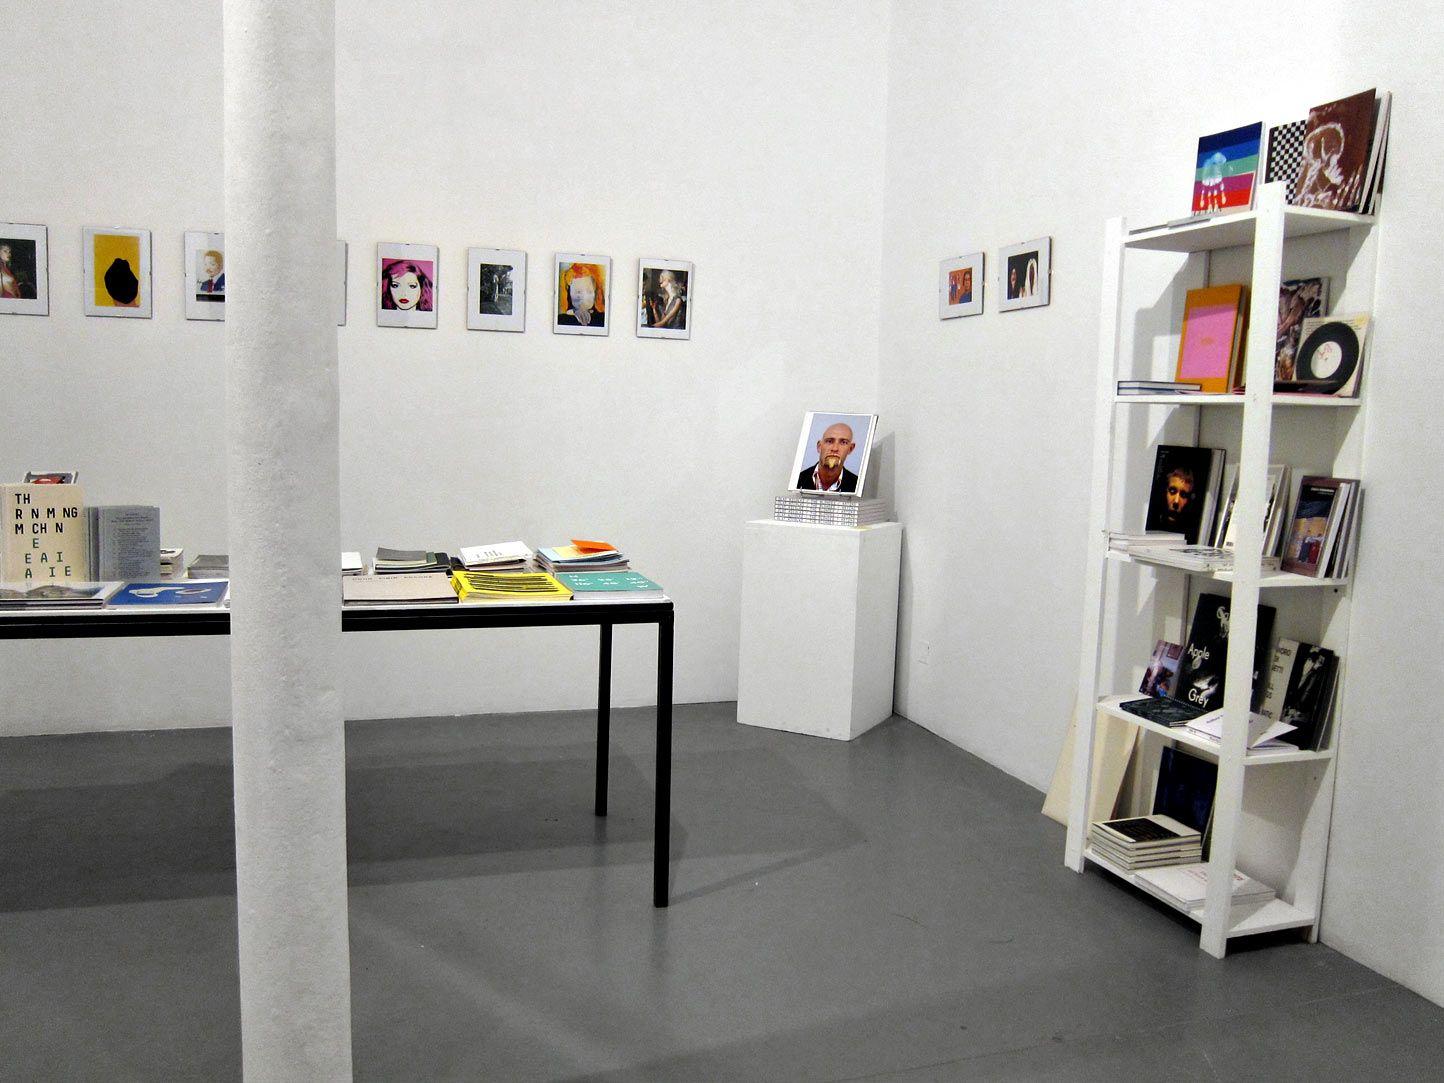 Librairie Yvon Lambert 108 Rue Vieille Du Temple Paris Amazing Art Bookshop Attached To Parisian Blue Chip Commercial Gallery Yvon Lambert Librairie